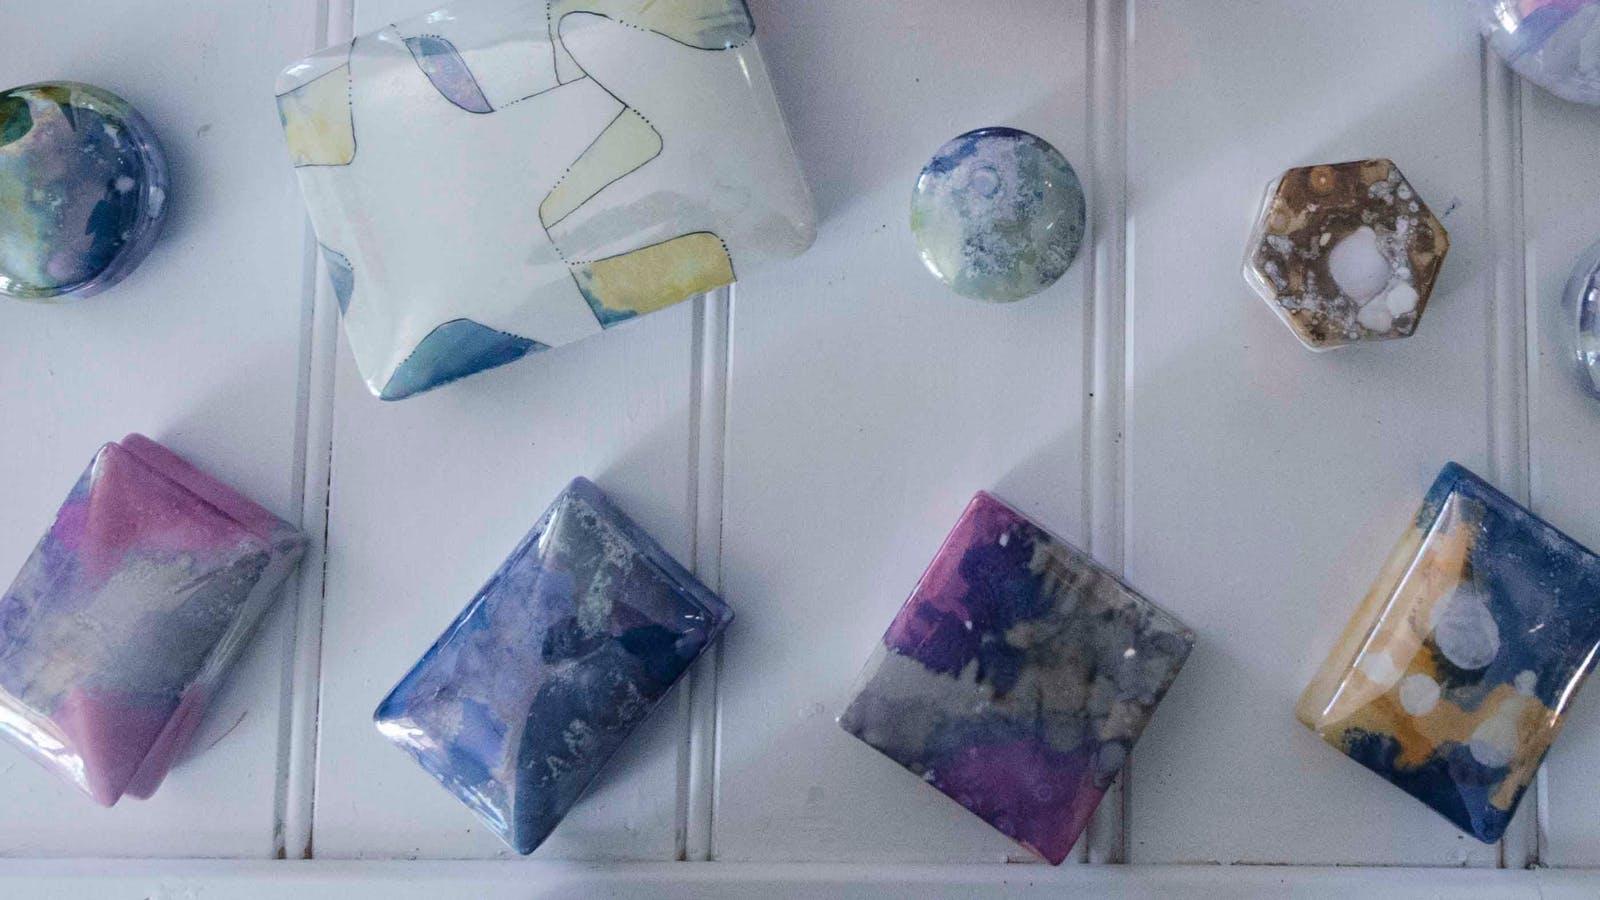 Ceramics Painted by Jan Verouden